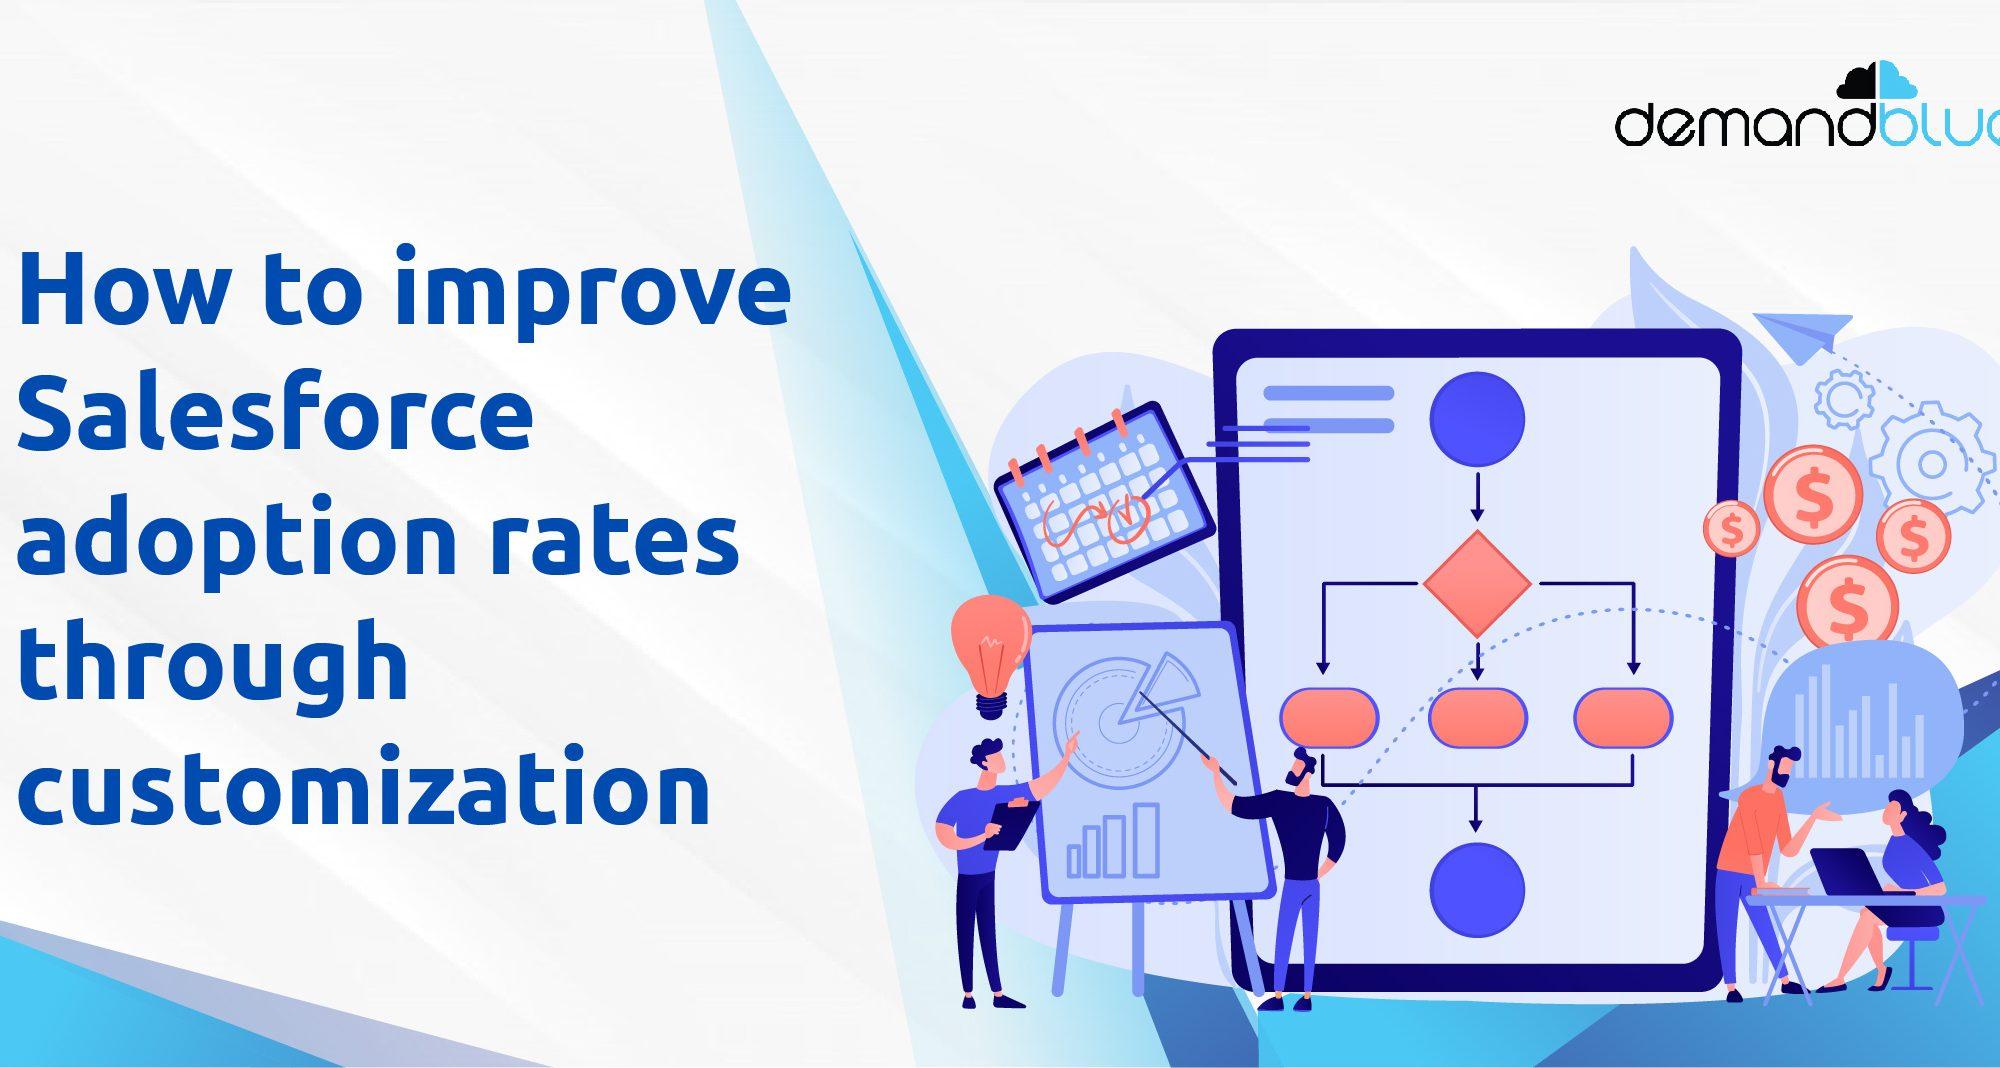 How to improve Salesforce adoption rates through customization